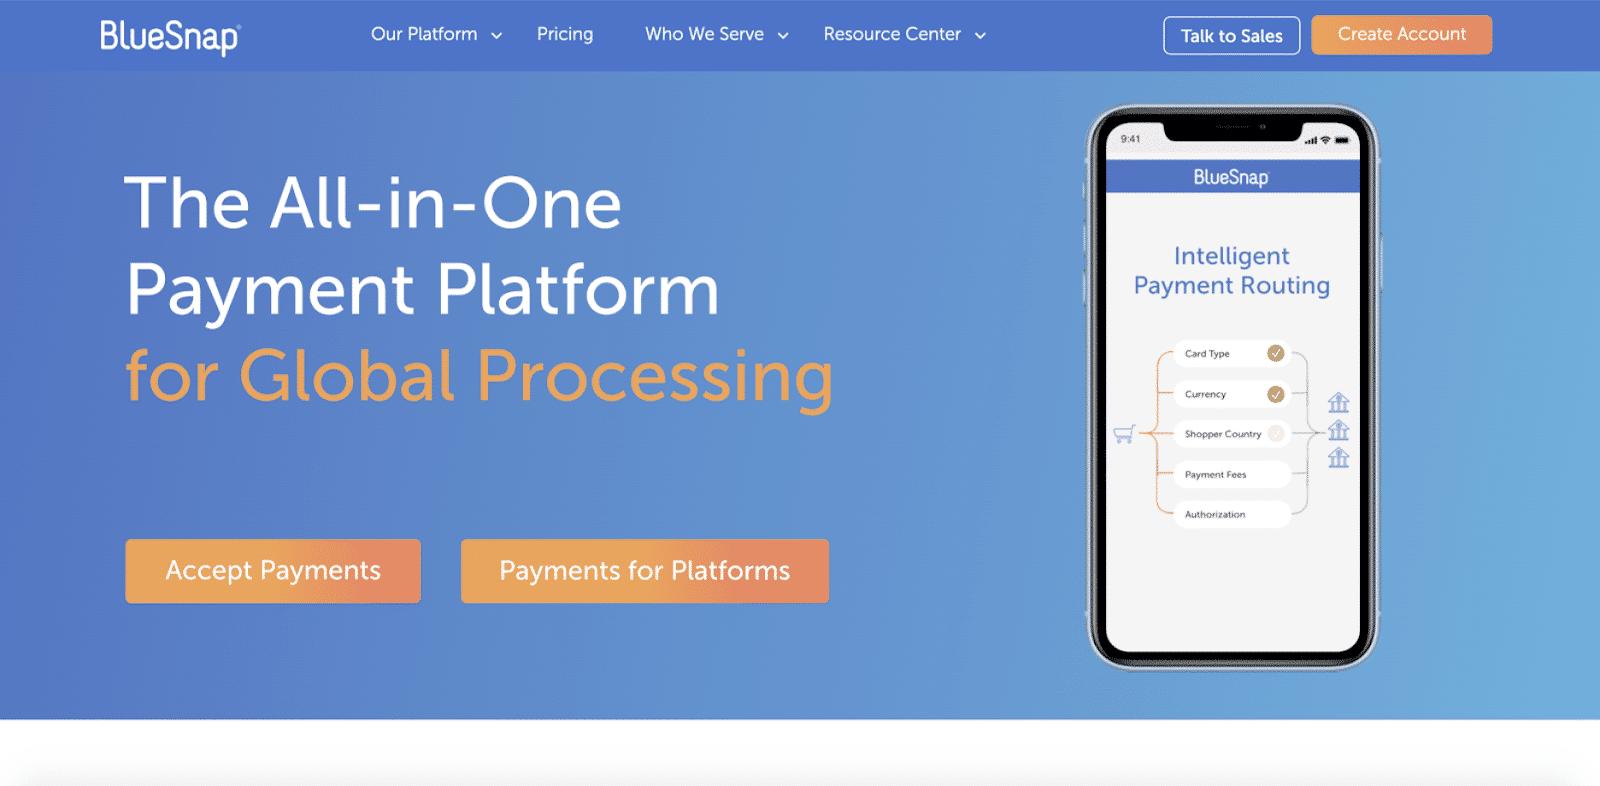 PayPal Alternative BlueSnap